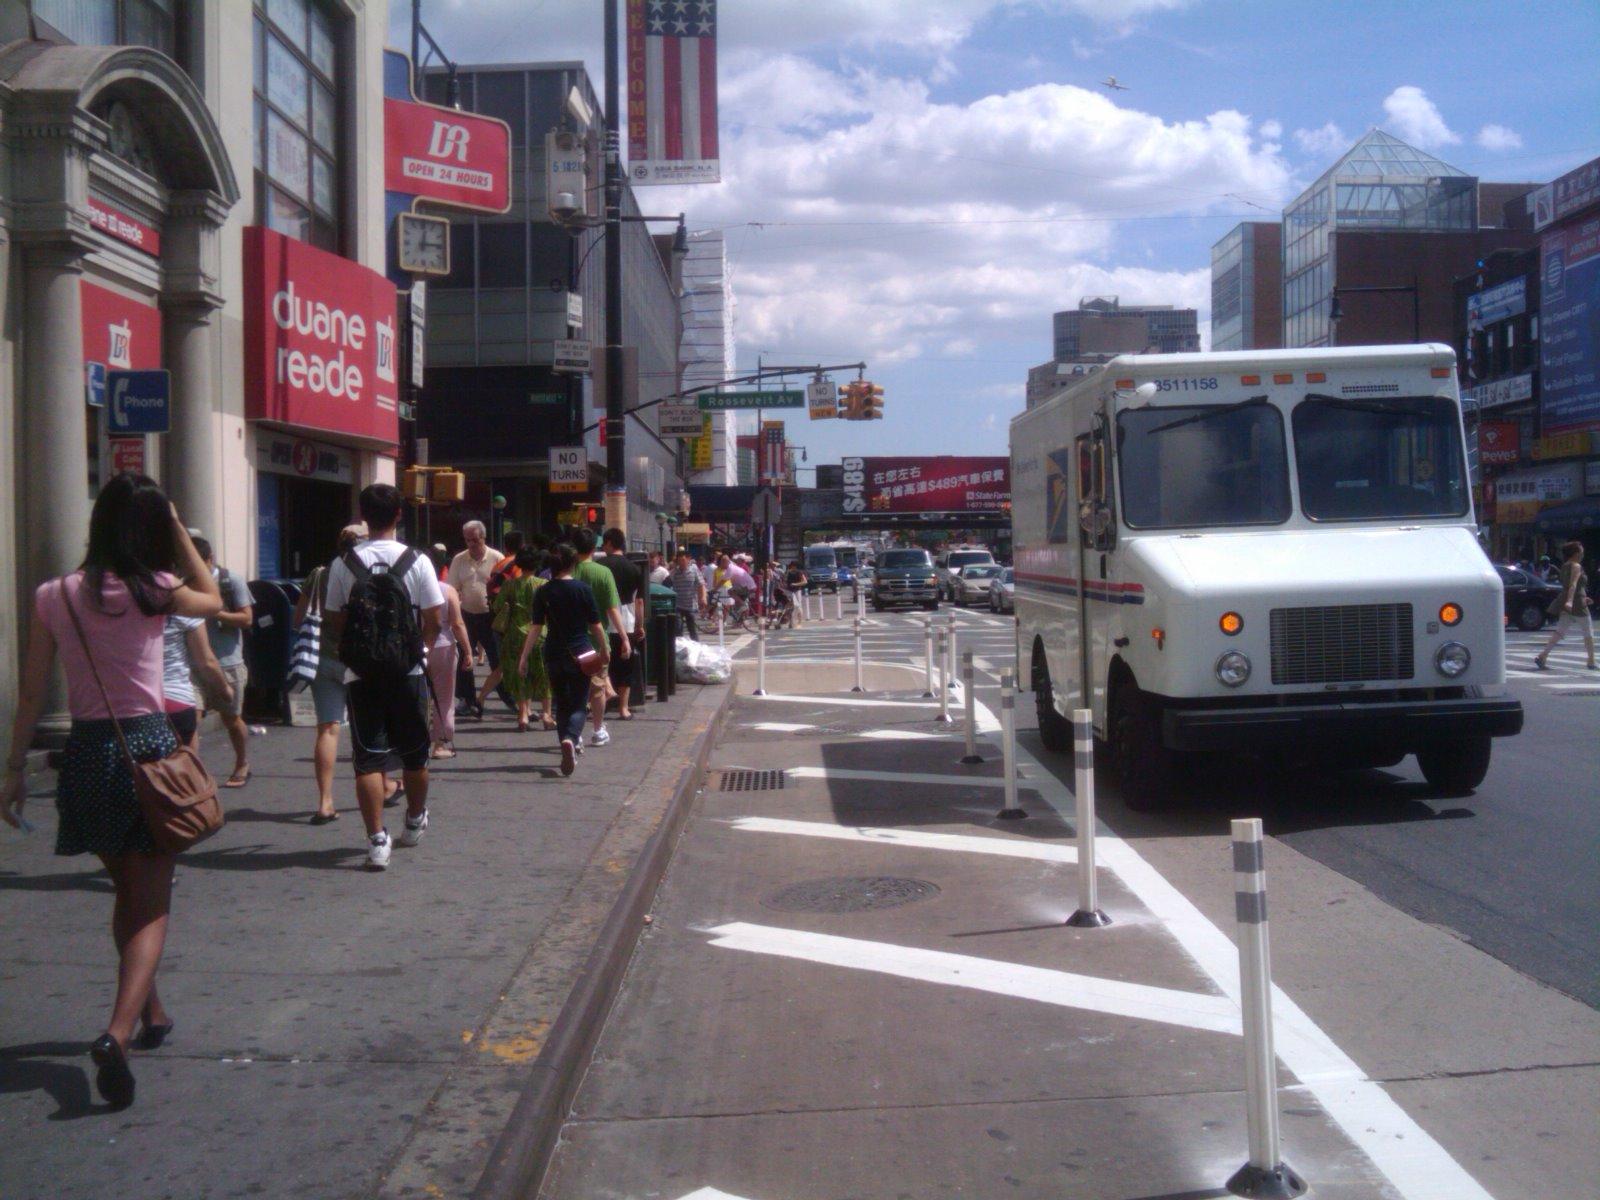 cap'n transit rides again: the anti-bus terminal